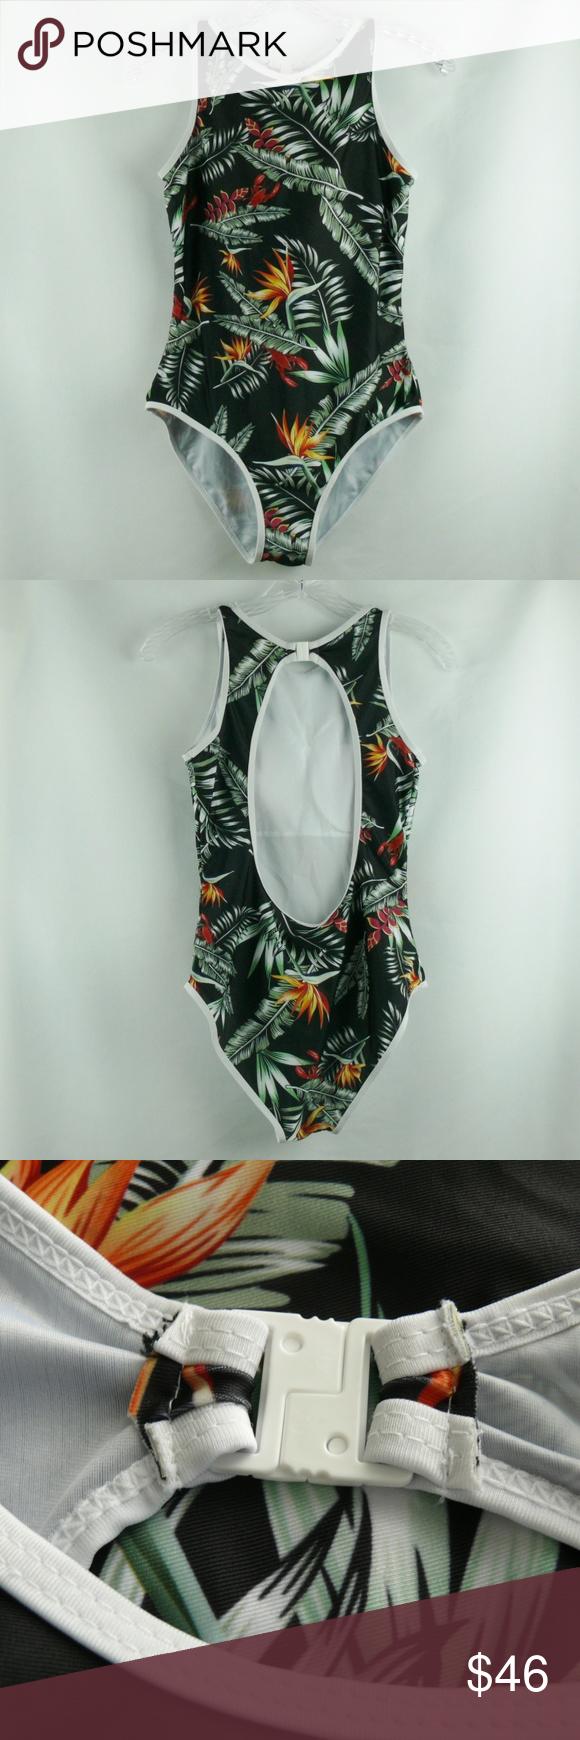 a56413afd507 Tropical Black One Piece Bathing Suit Cut Out Back